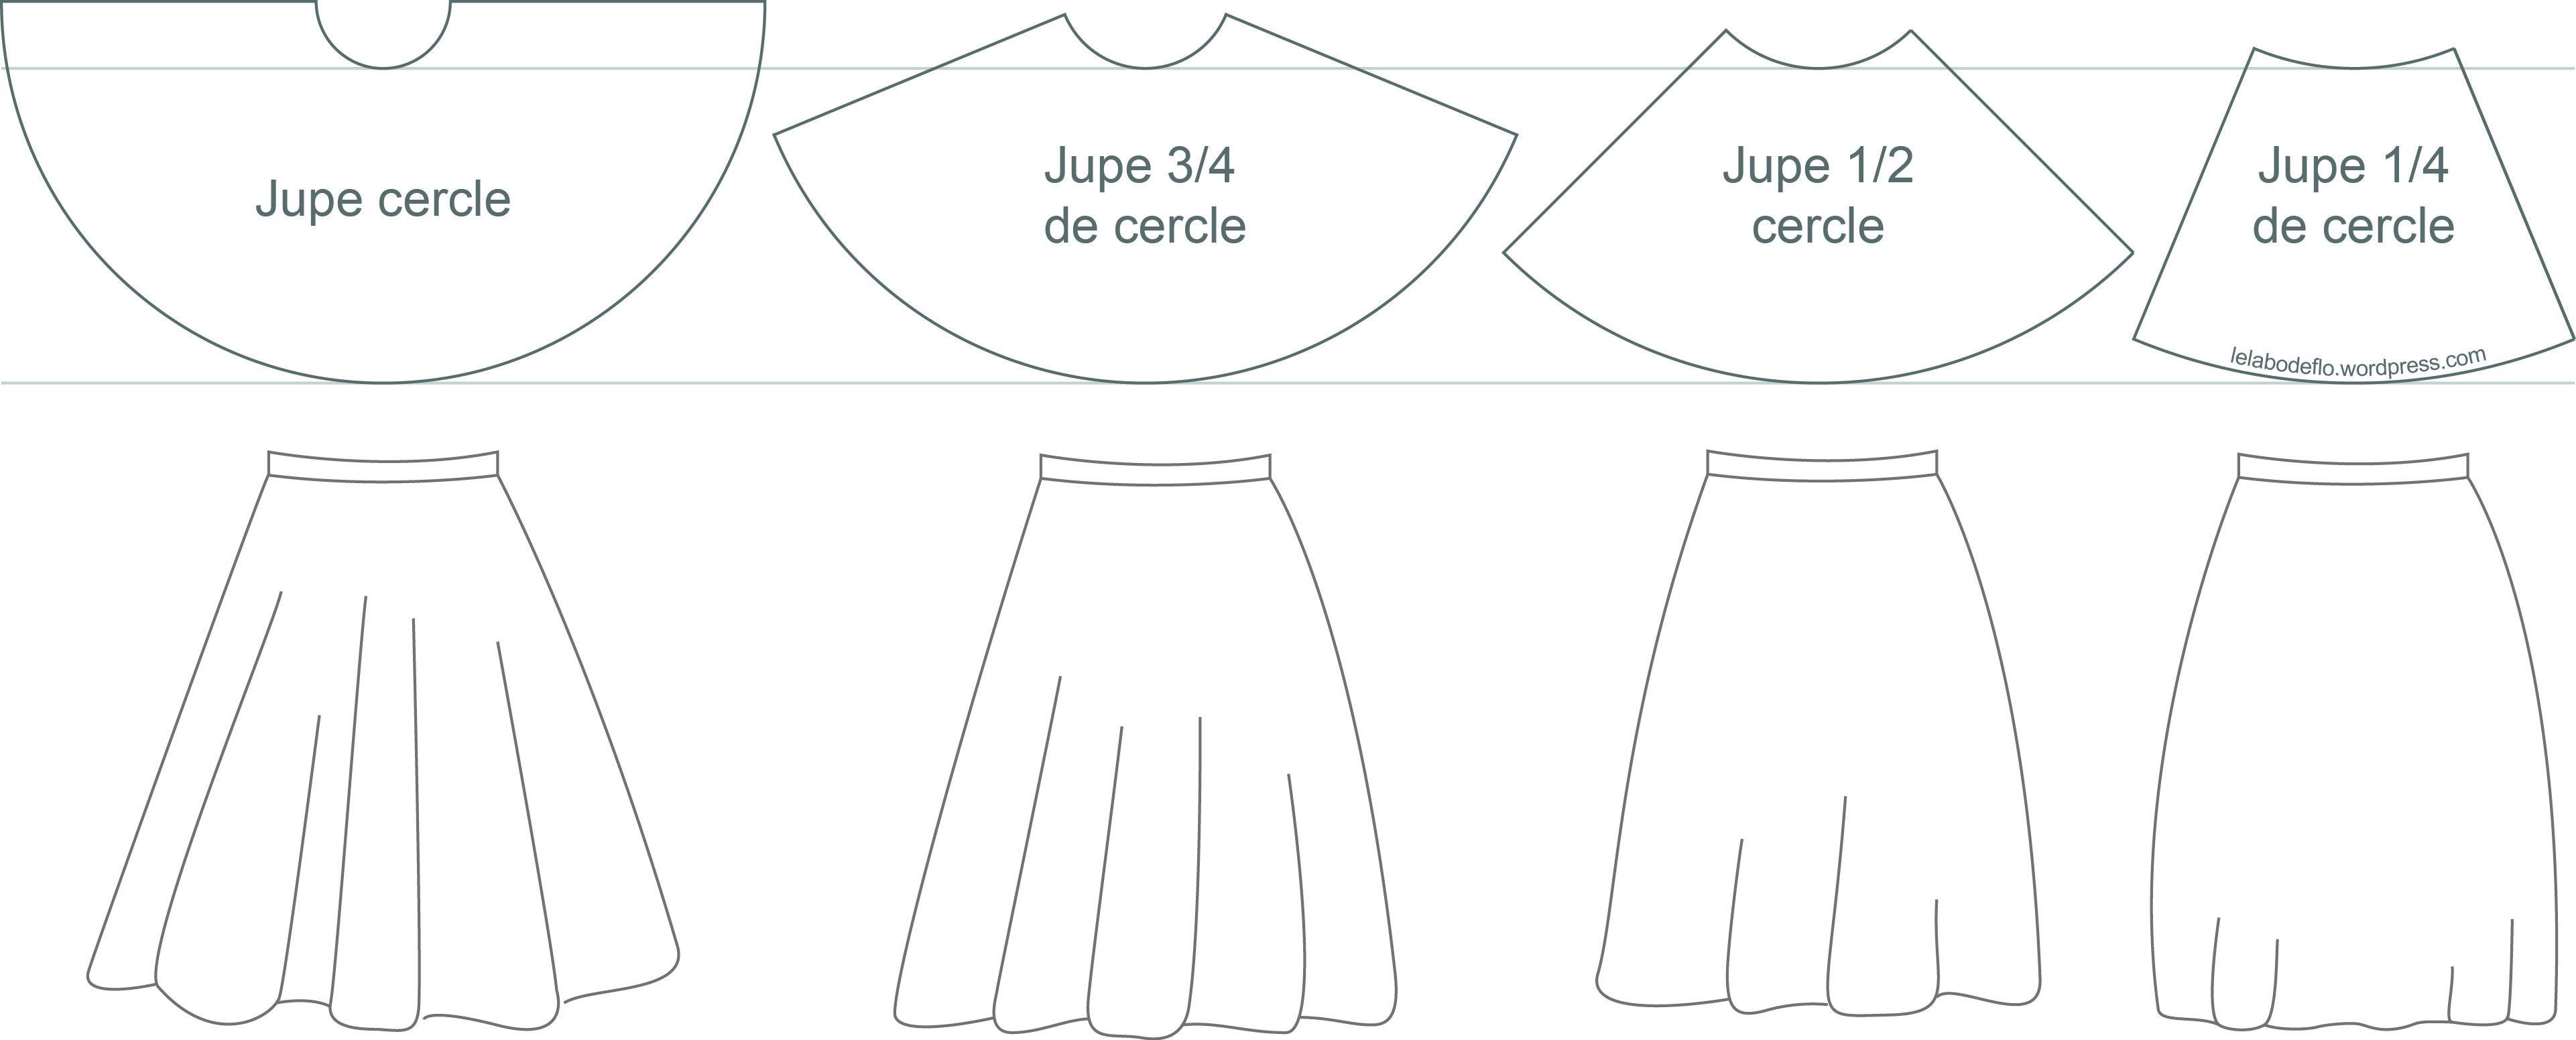 la jupe cercle mode d emploi les jupes la mati re et pli. Black Bedroom Furniture Sets. Home Design Ideas